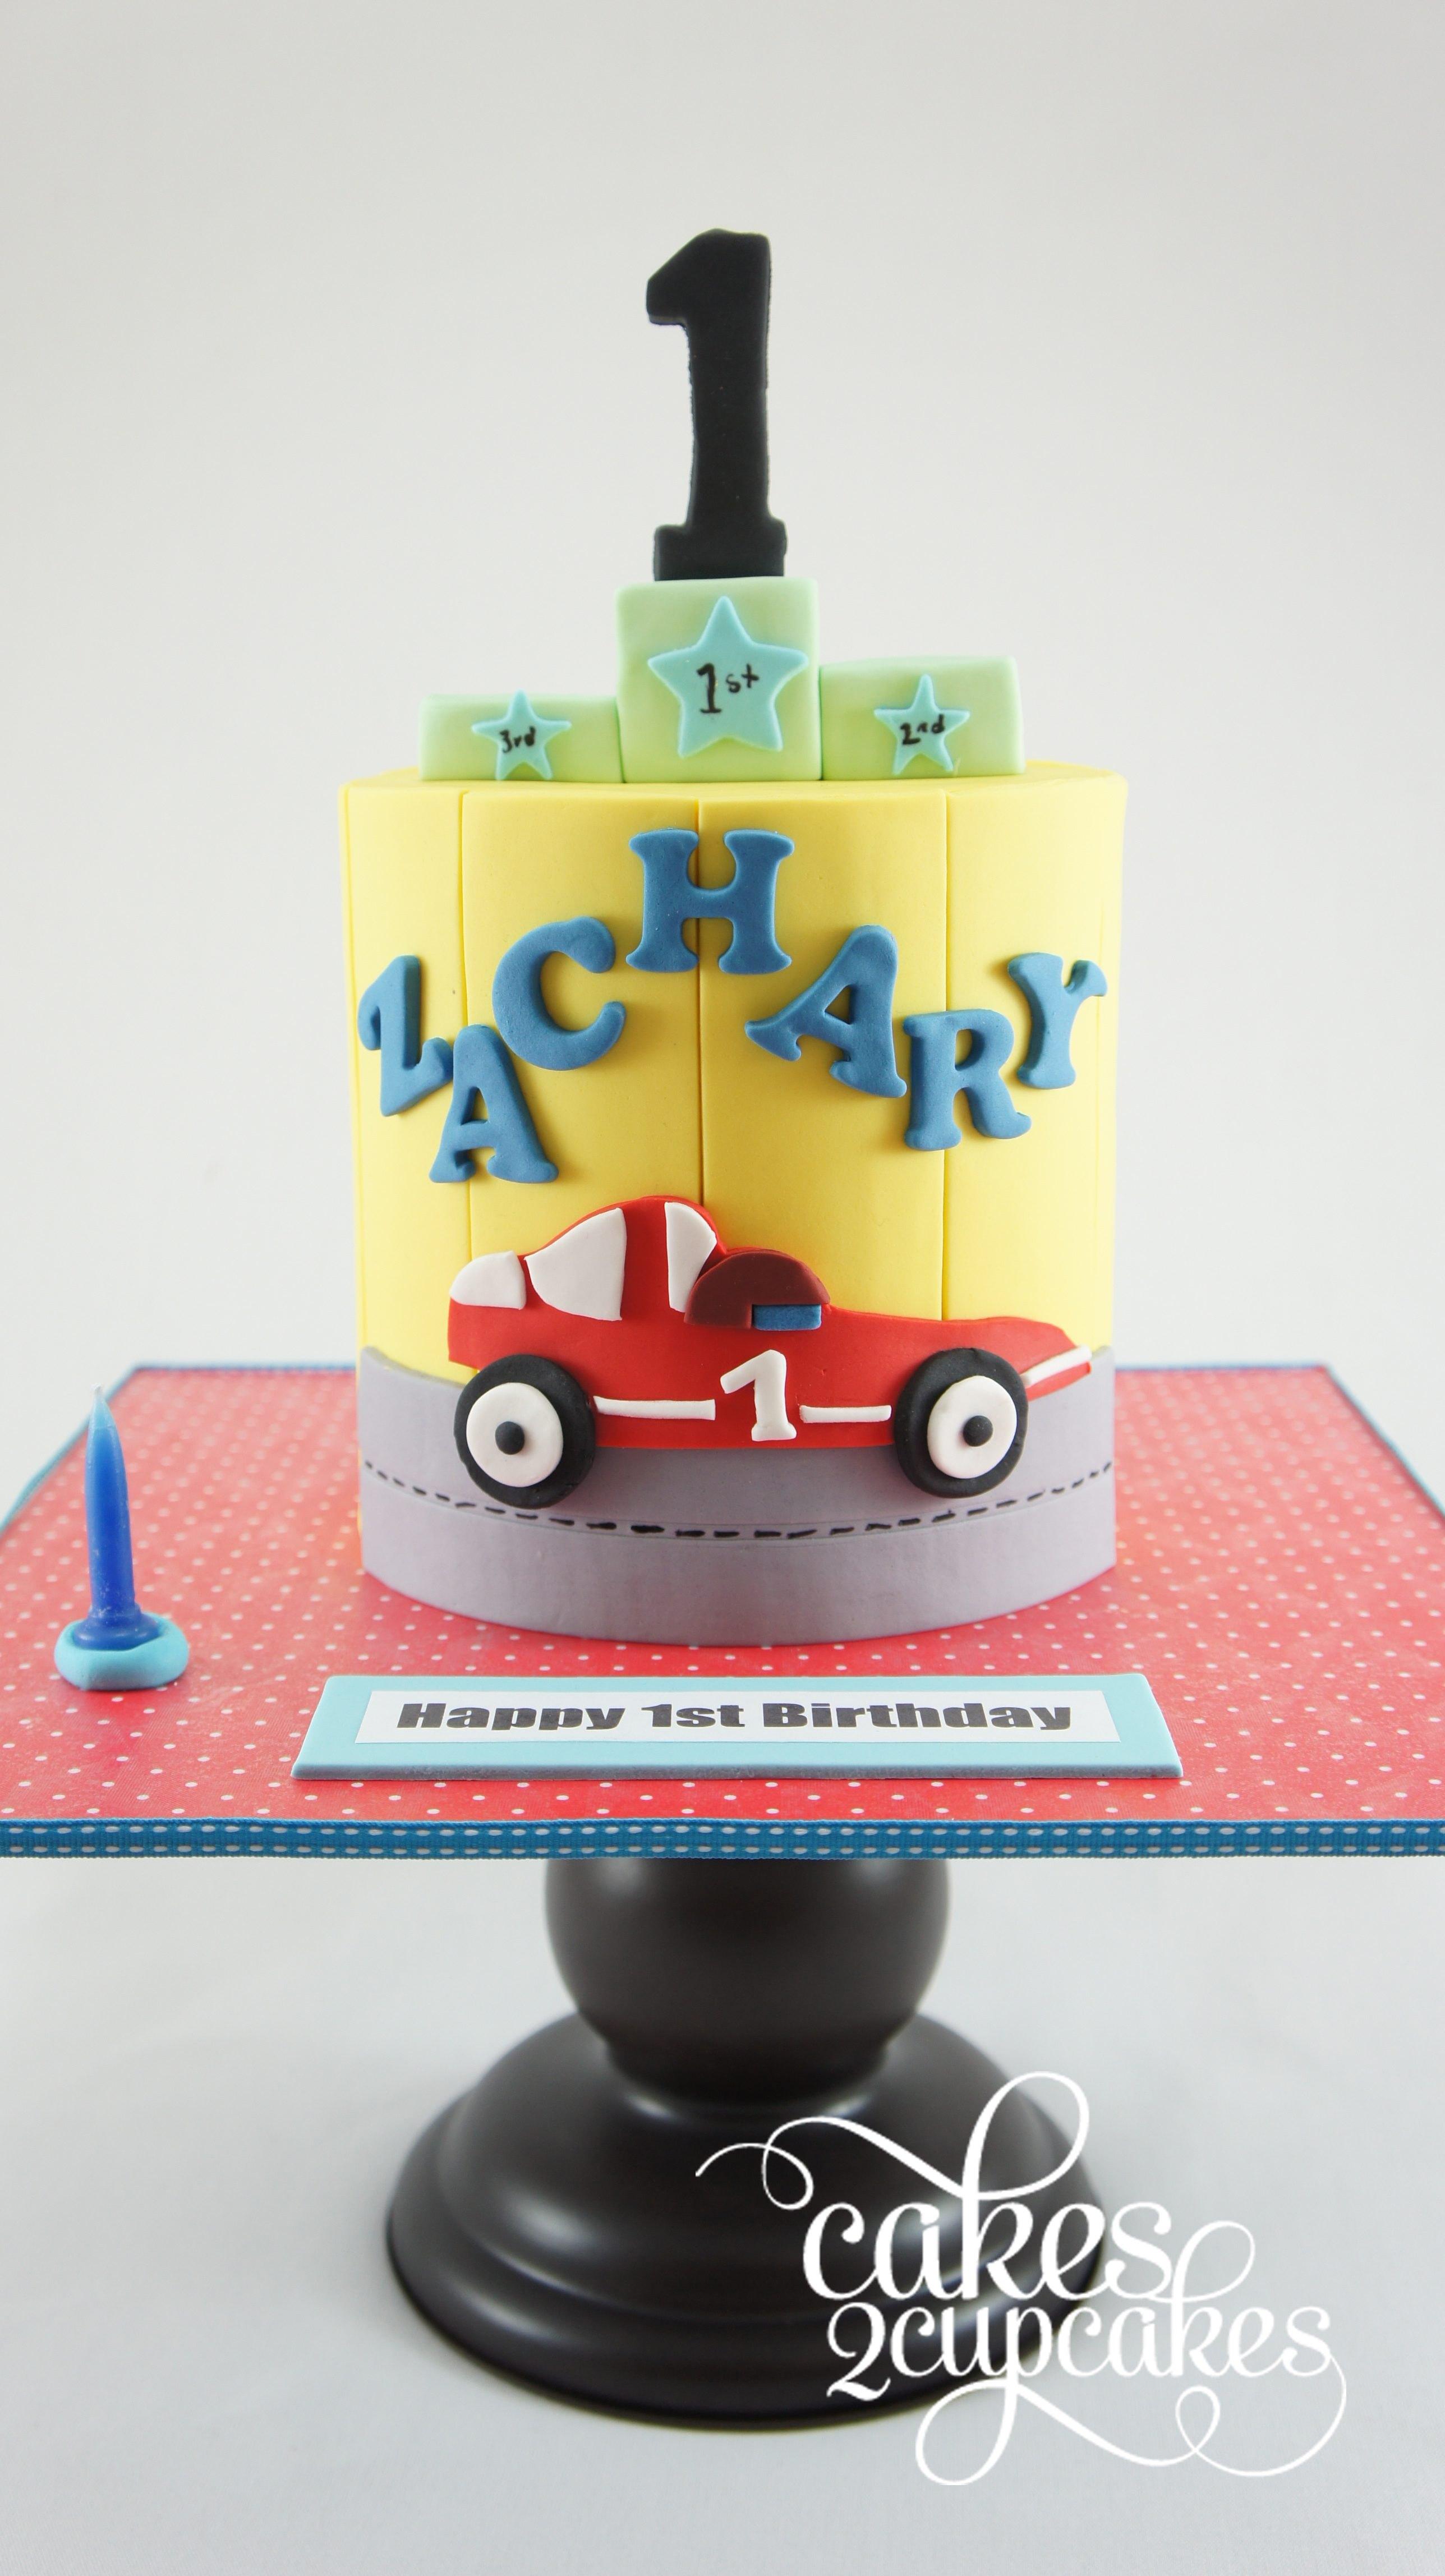 cakes2cupcakes-car-cake.jpg